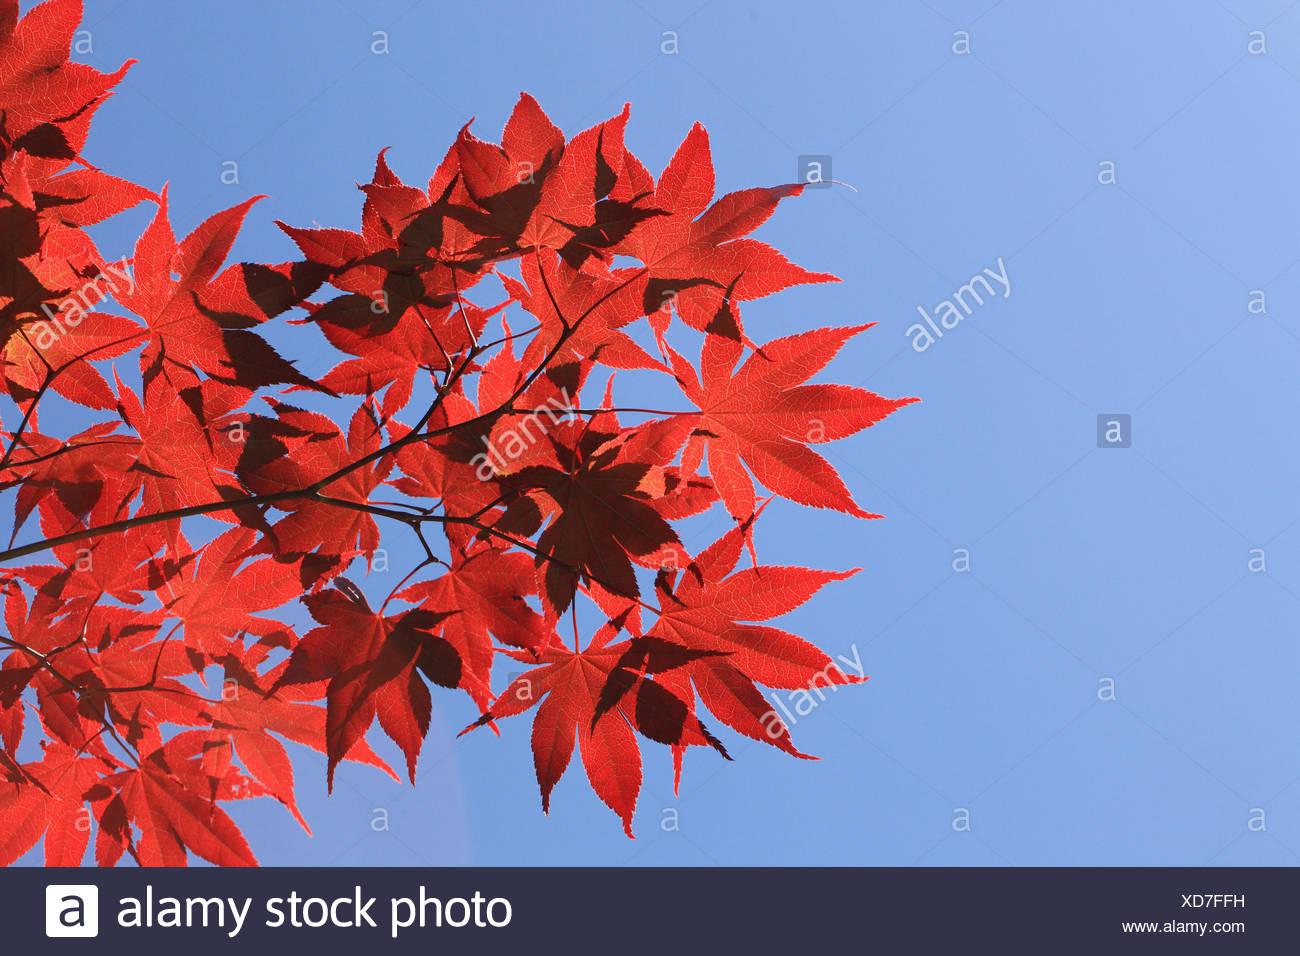 Acero Blu Giapponese giapponese o palmate acero acer palmatum, retroilluminato